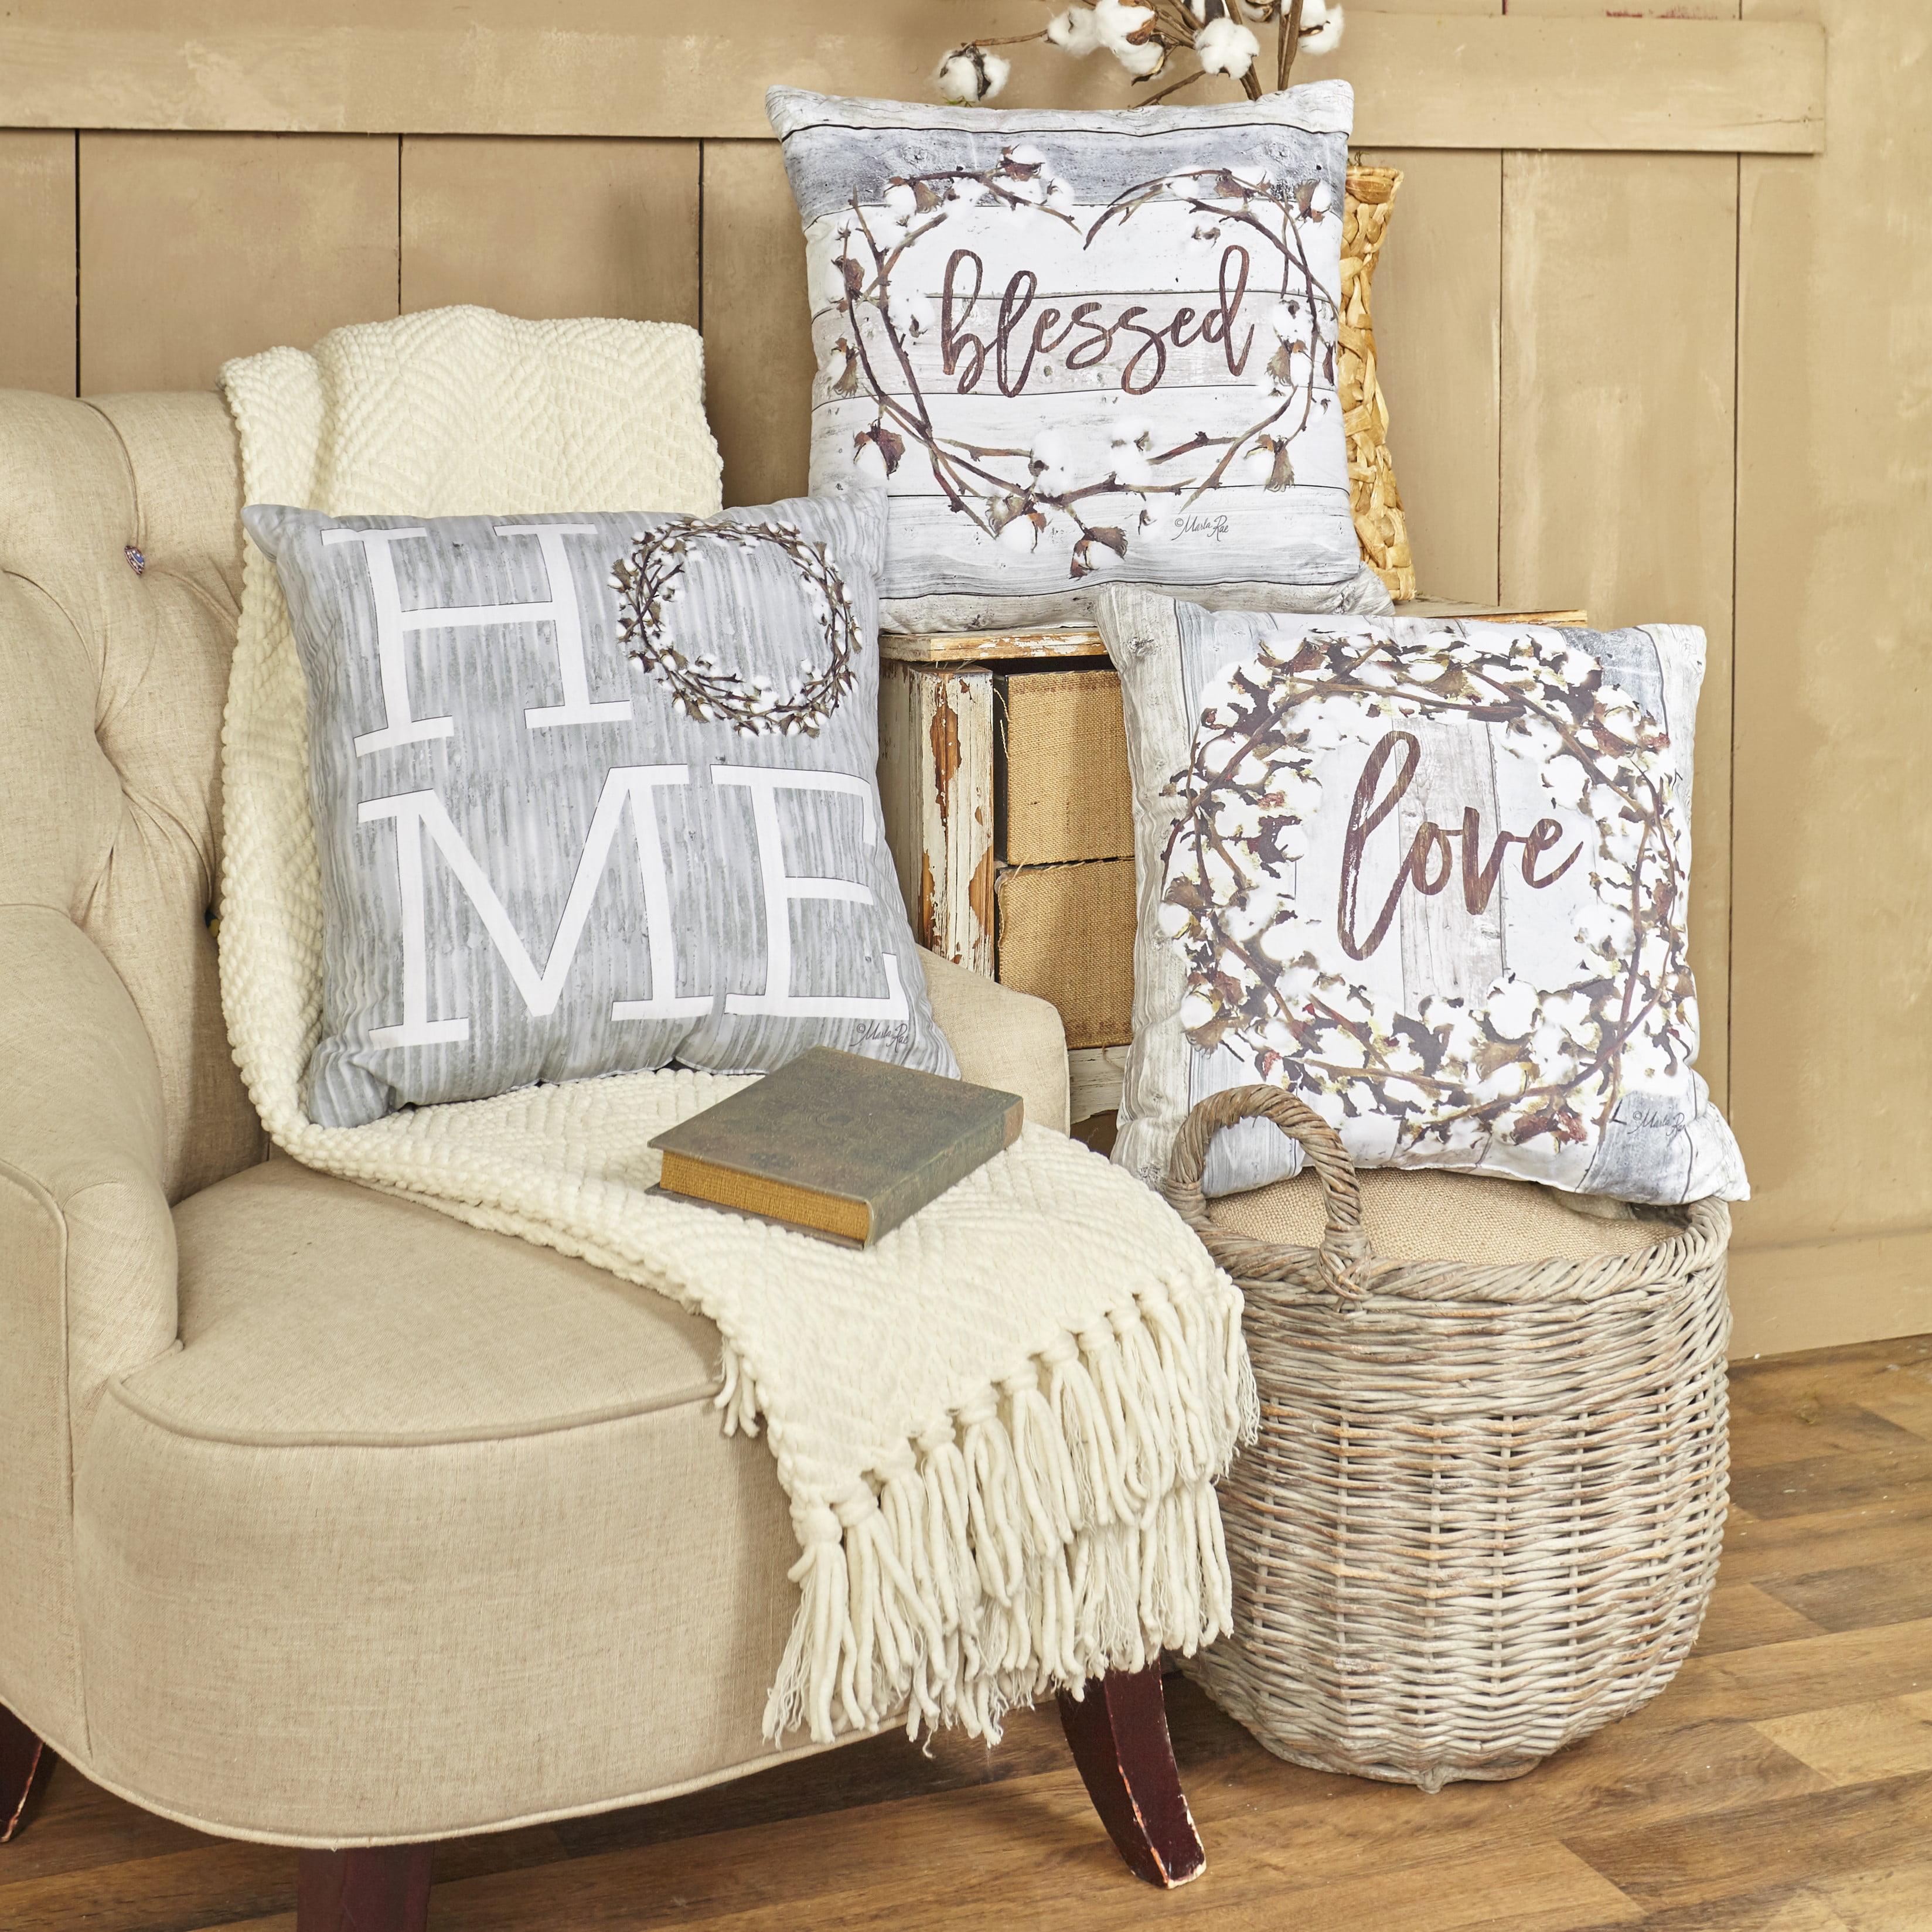 Cotton Boll Accent Pillows With Farmhouse Sentiments 3 Pcs Walmart Com Walmart Com